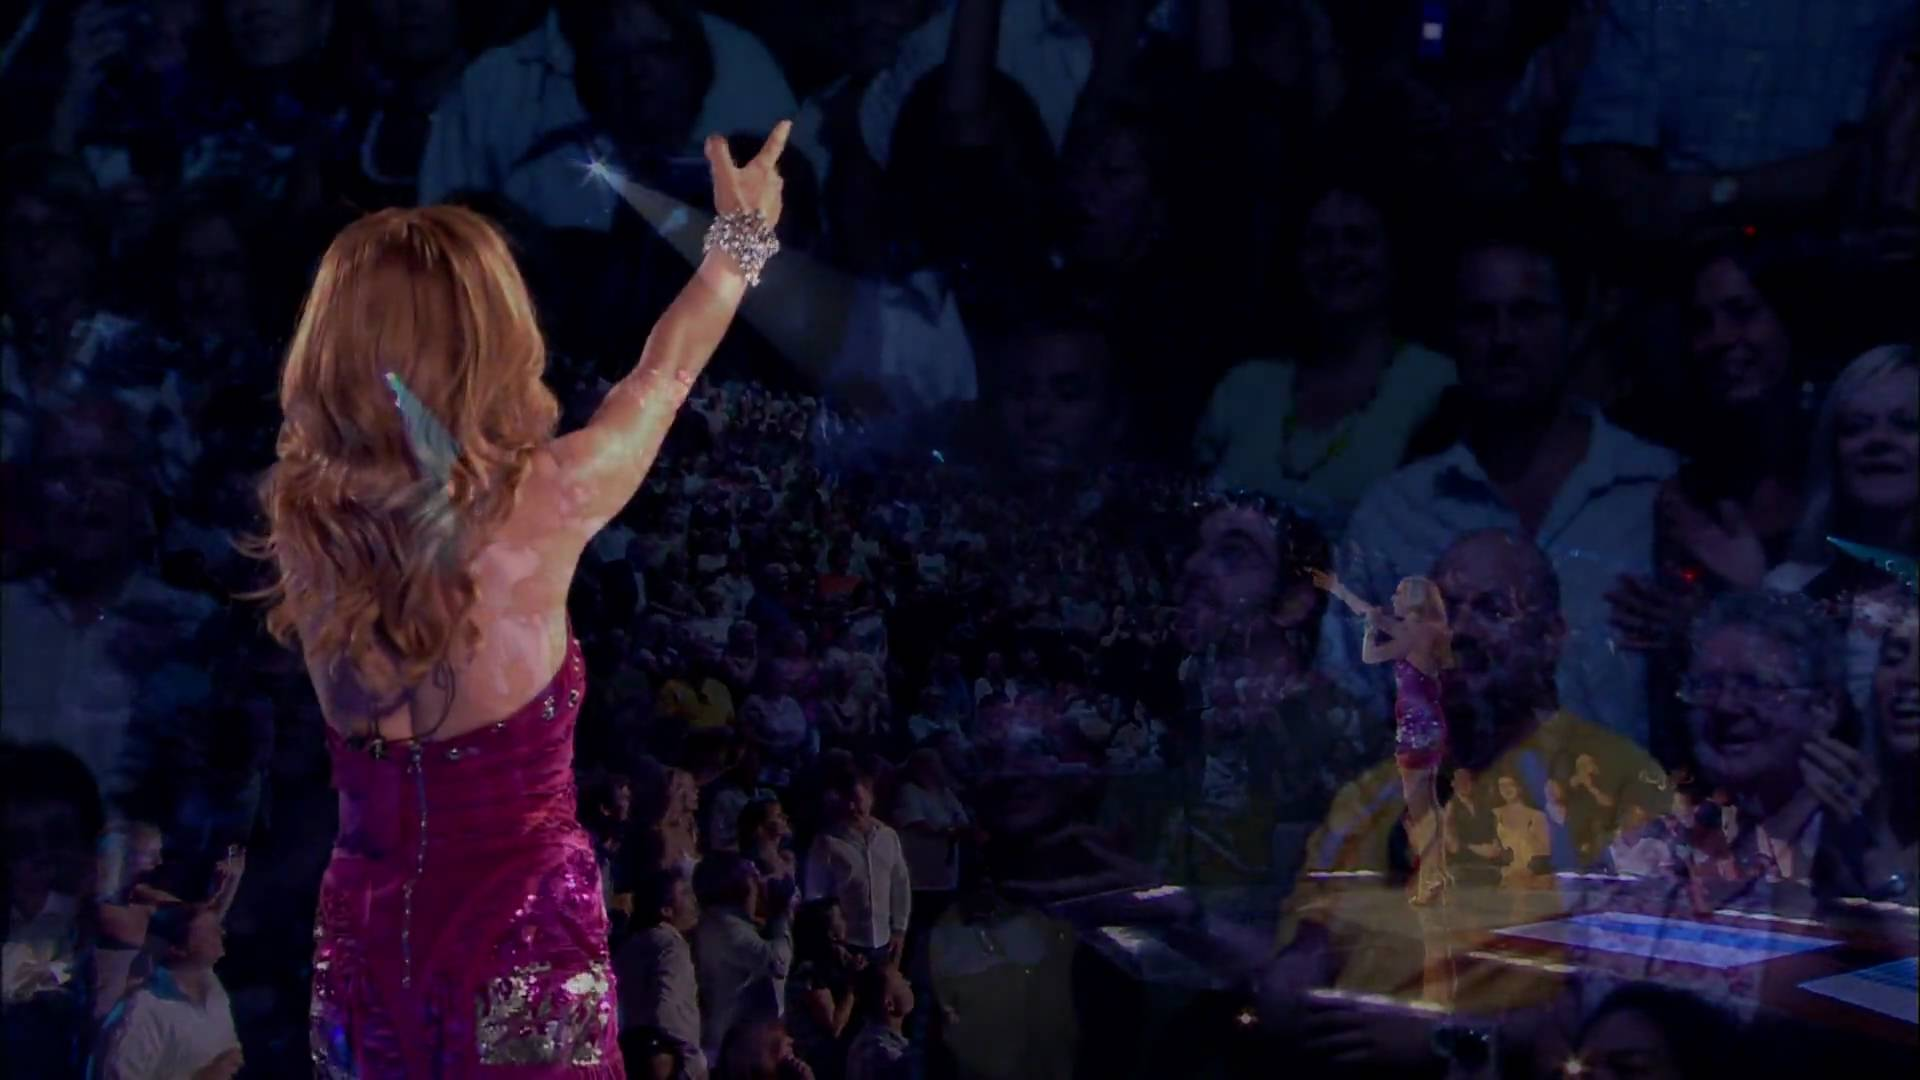 Celine Dion announces summer 2016 tour dates in Canada